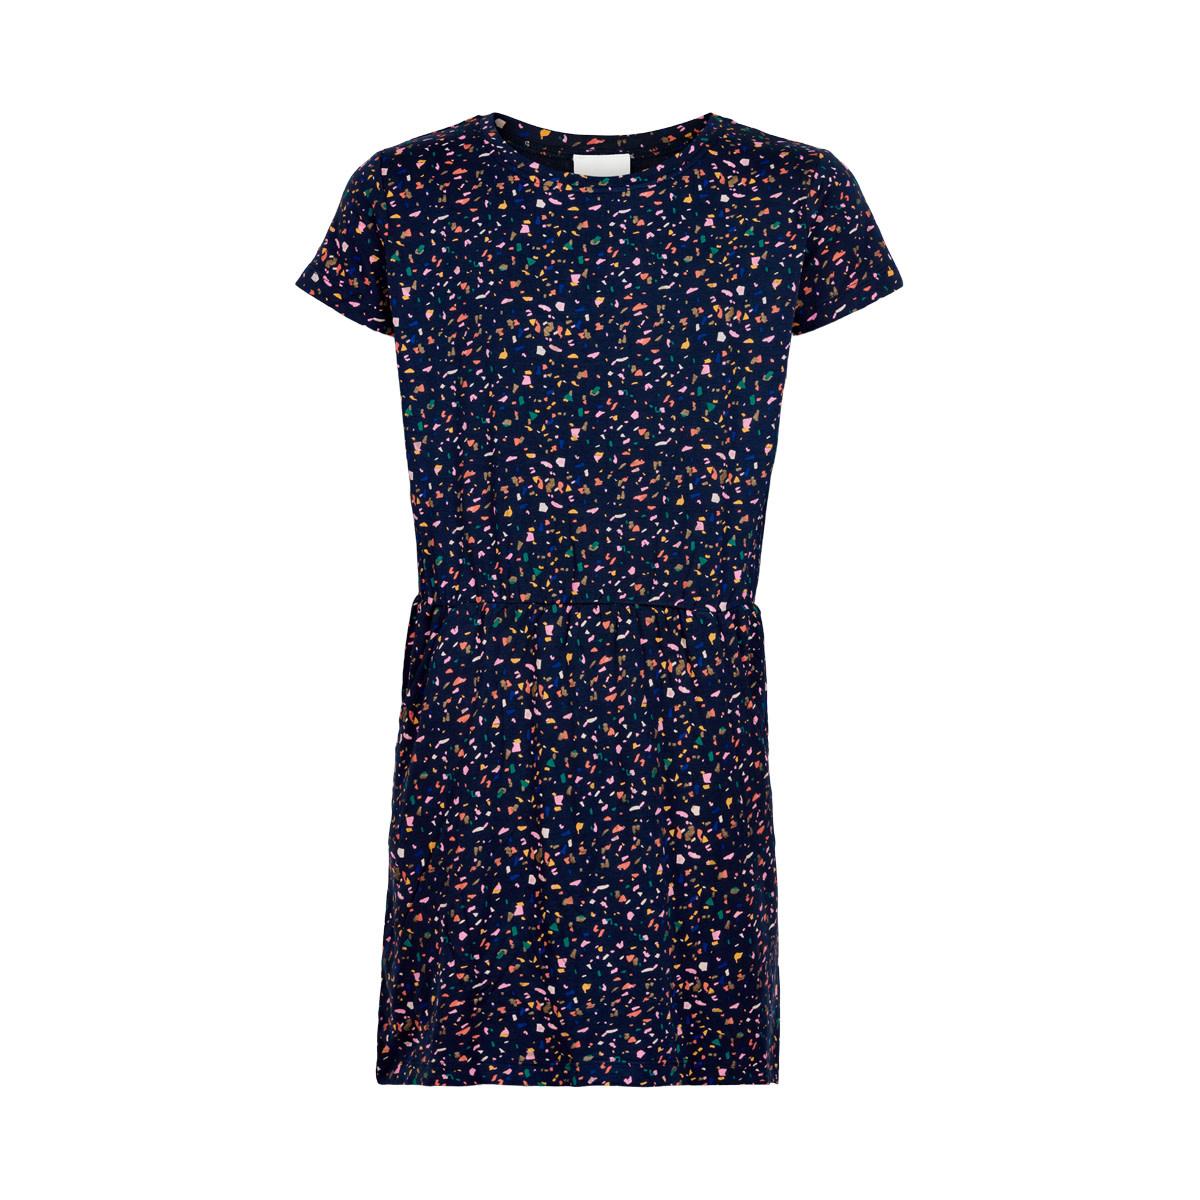 Ulise Dress - Confetti Print